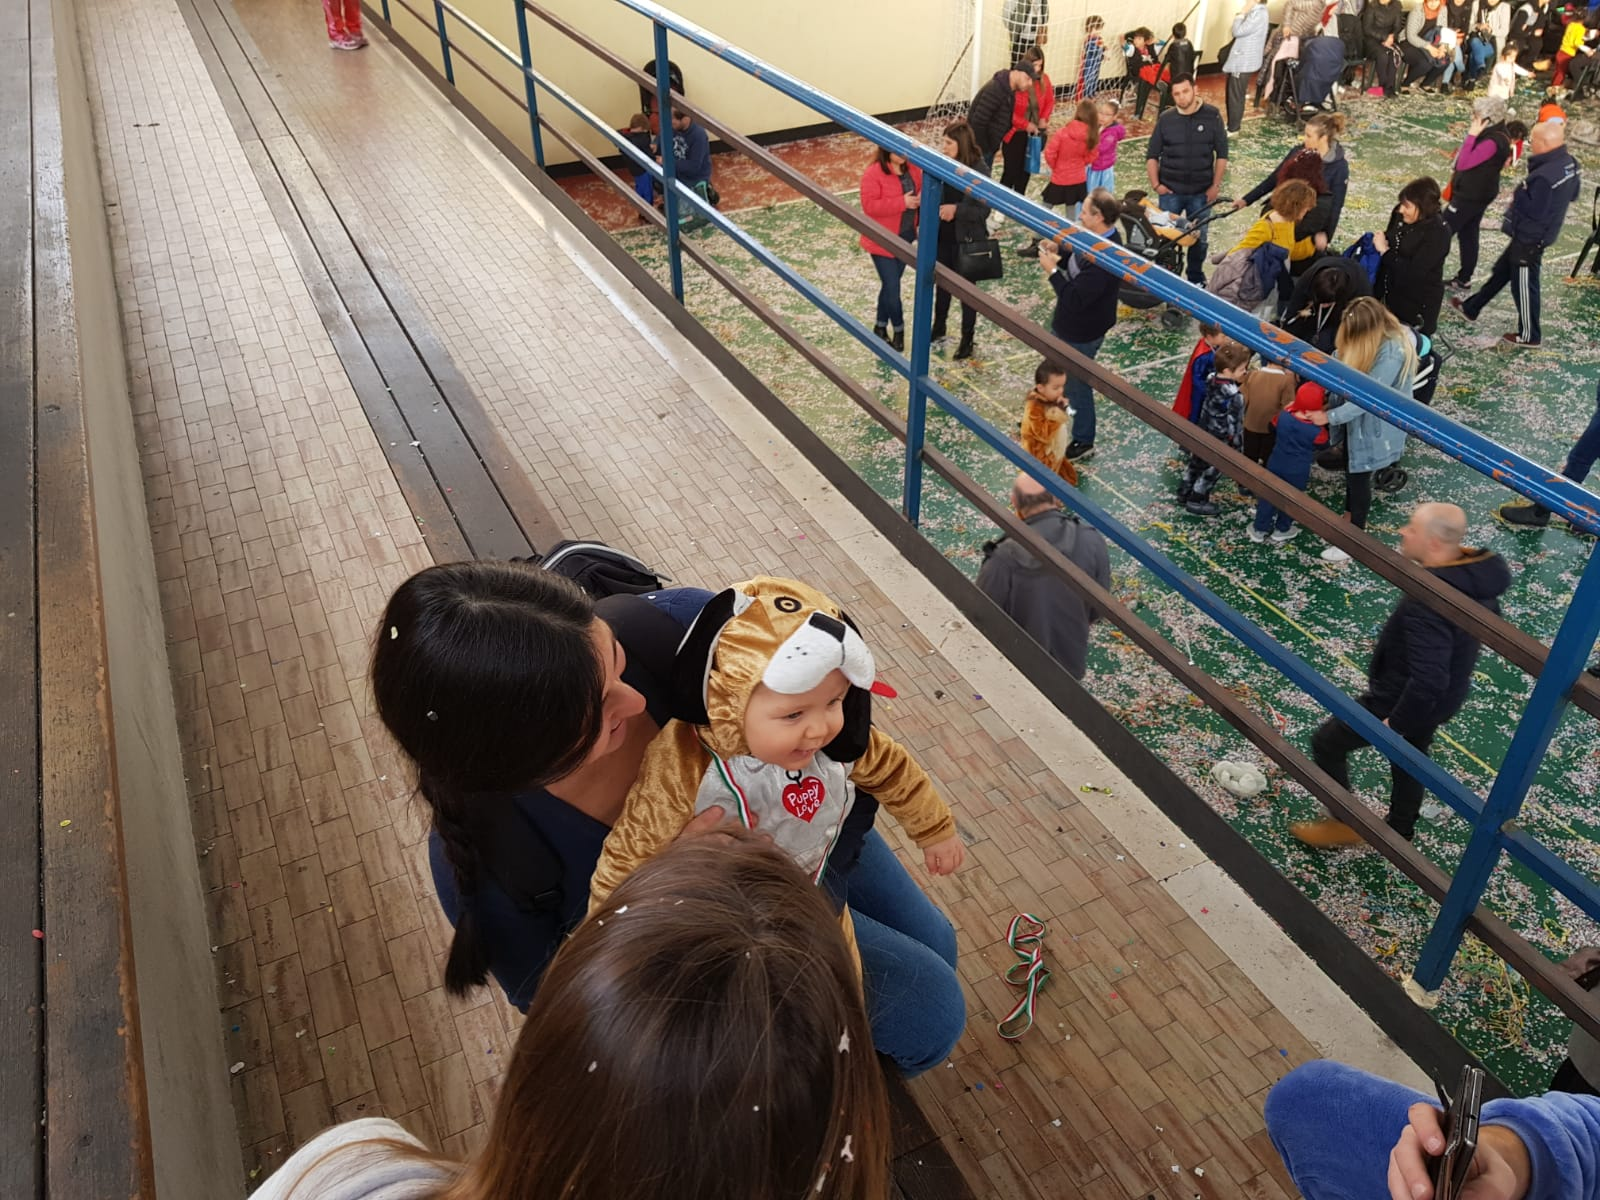 Baraonda Carnevale 2019 (292)